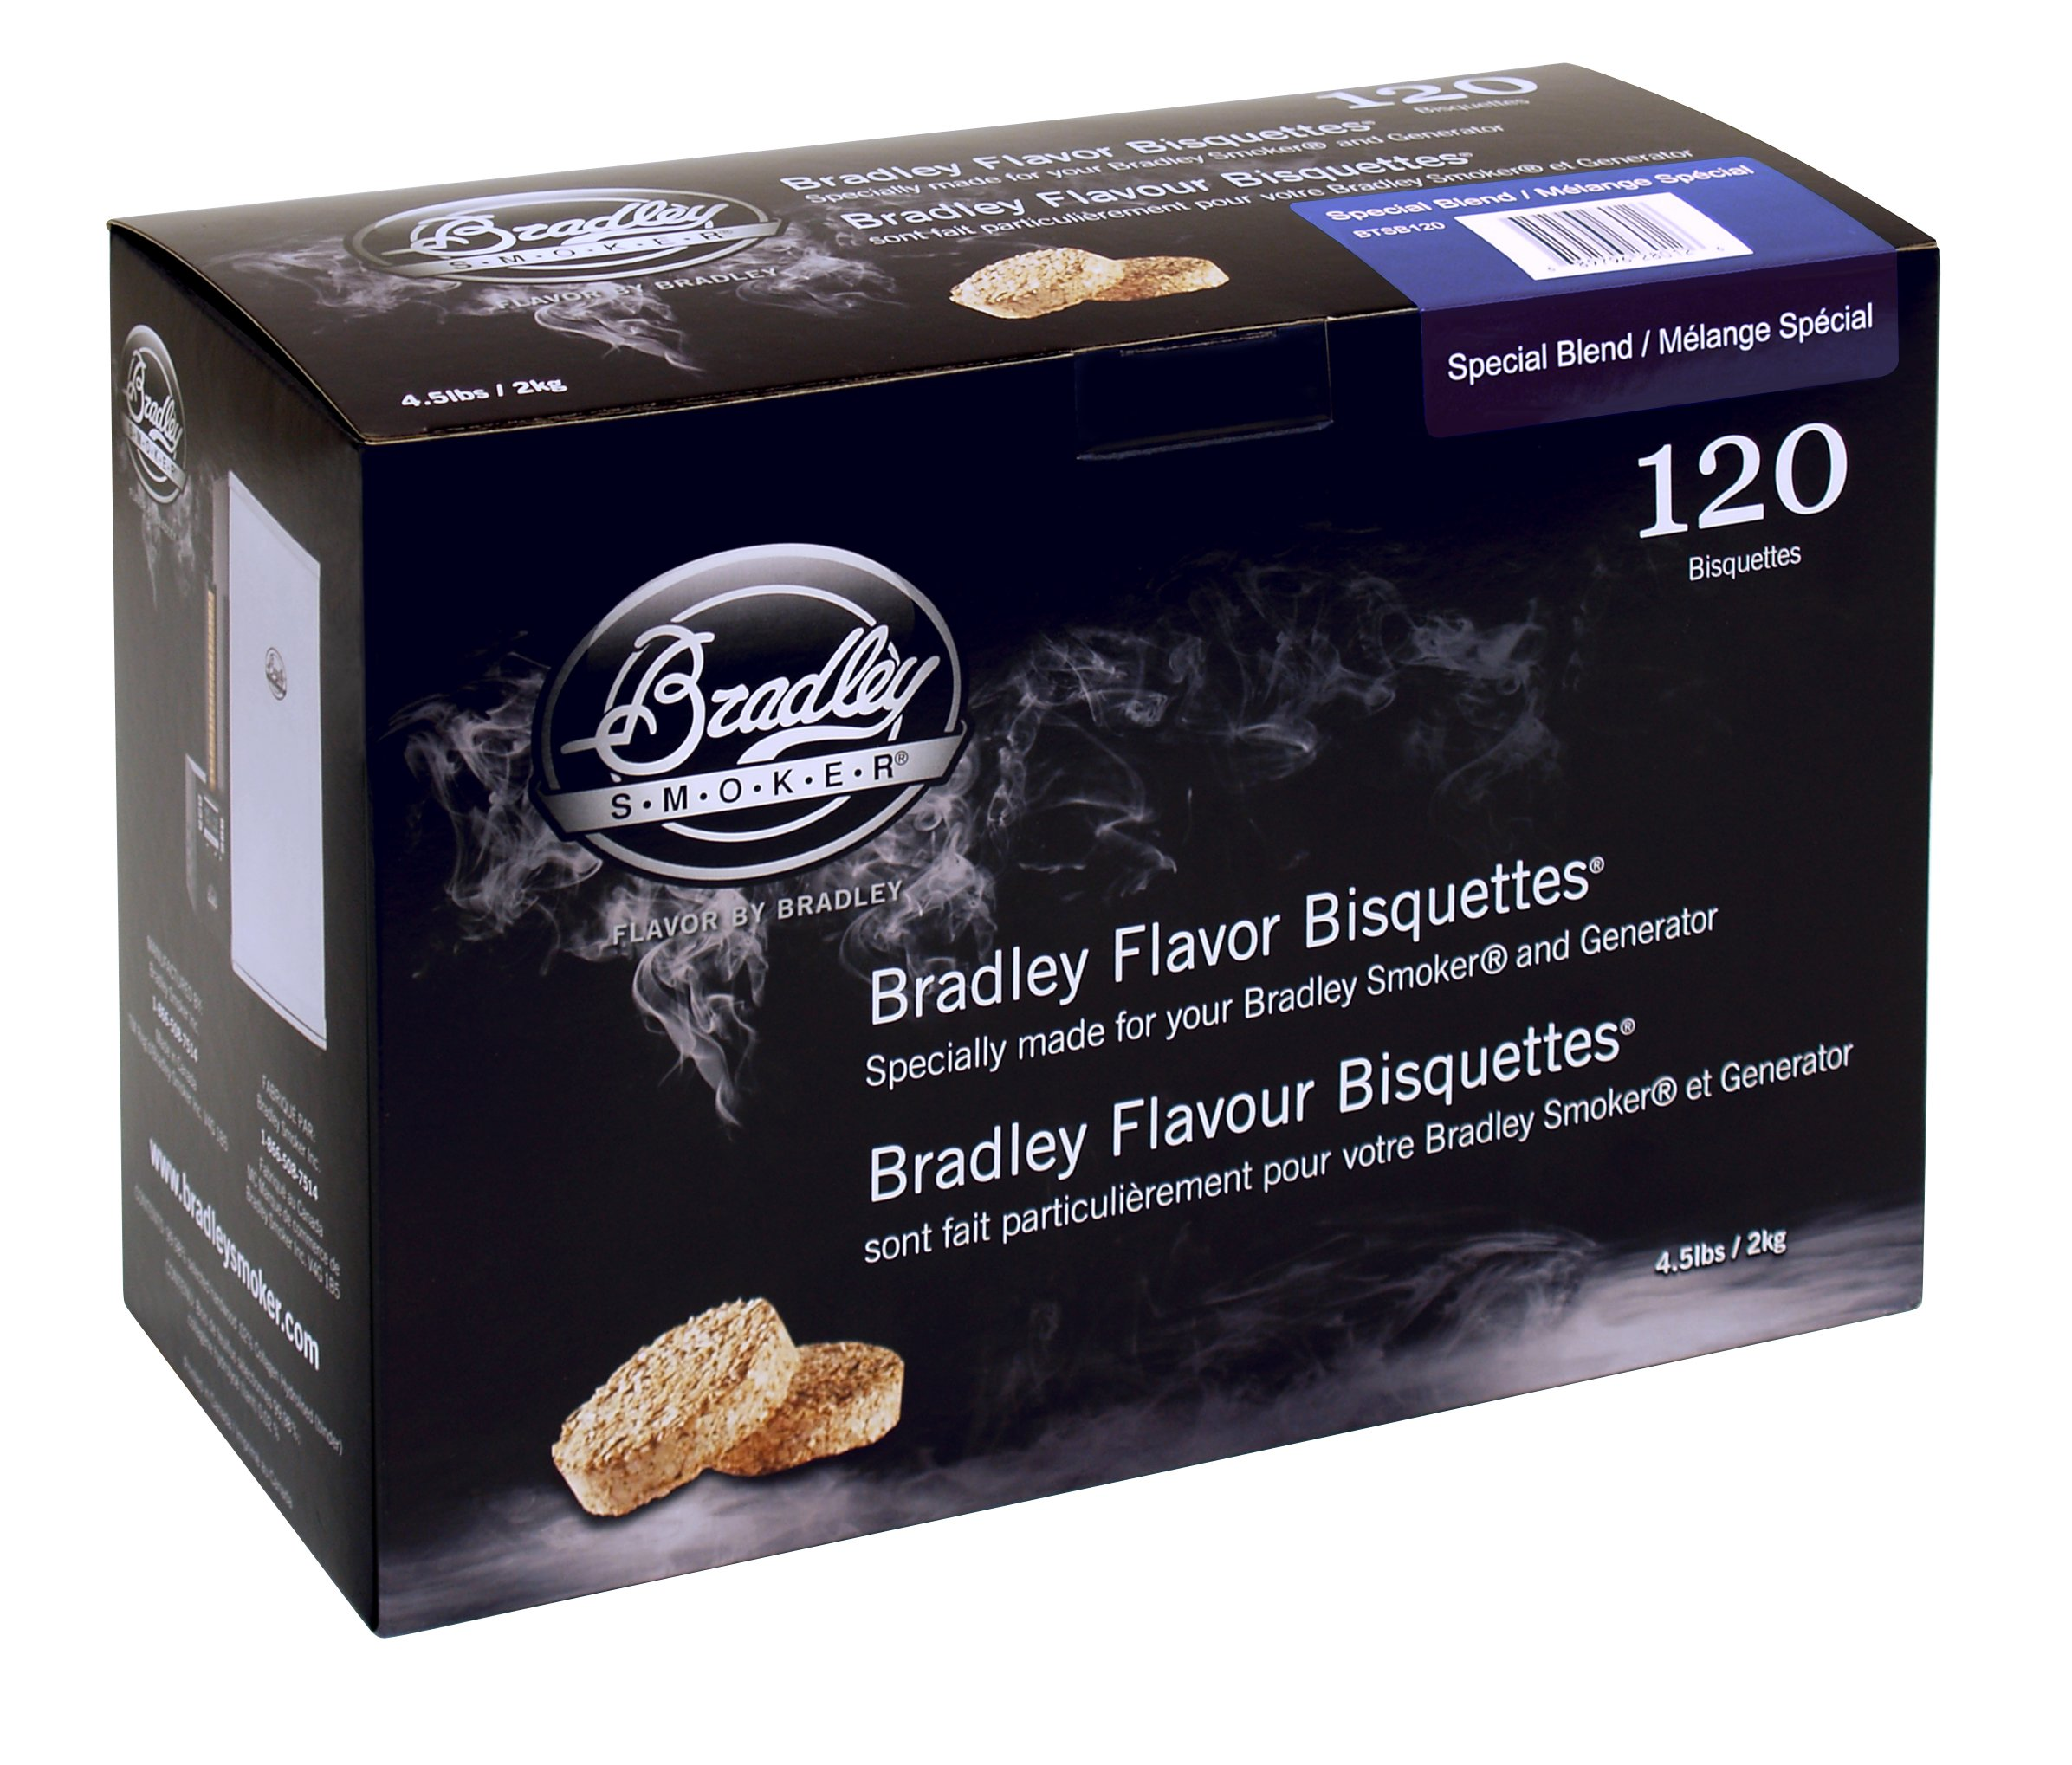 Bradley Smoker Special Blend 120 pack by Bradley Smoker